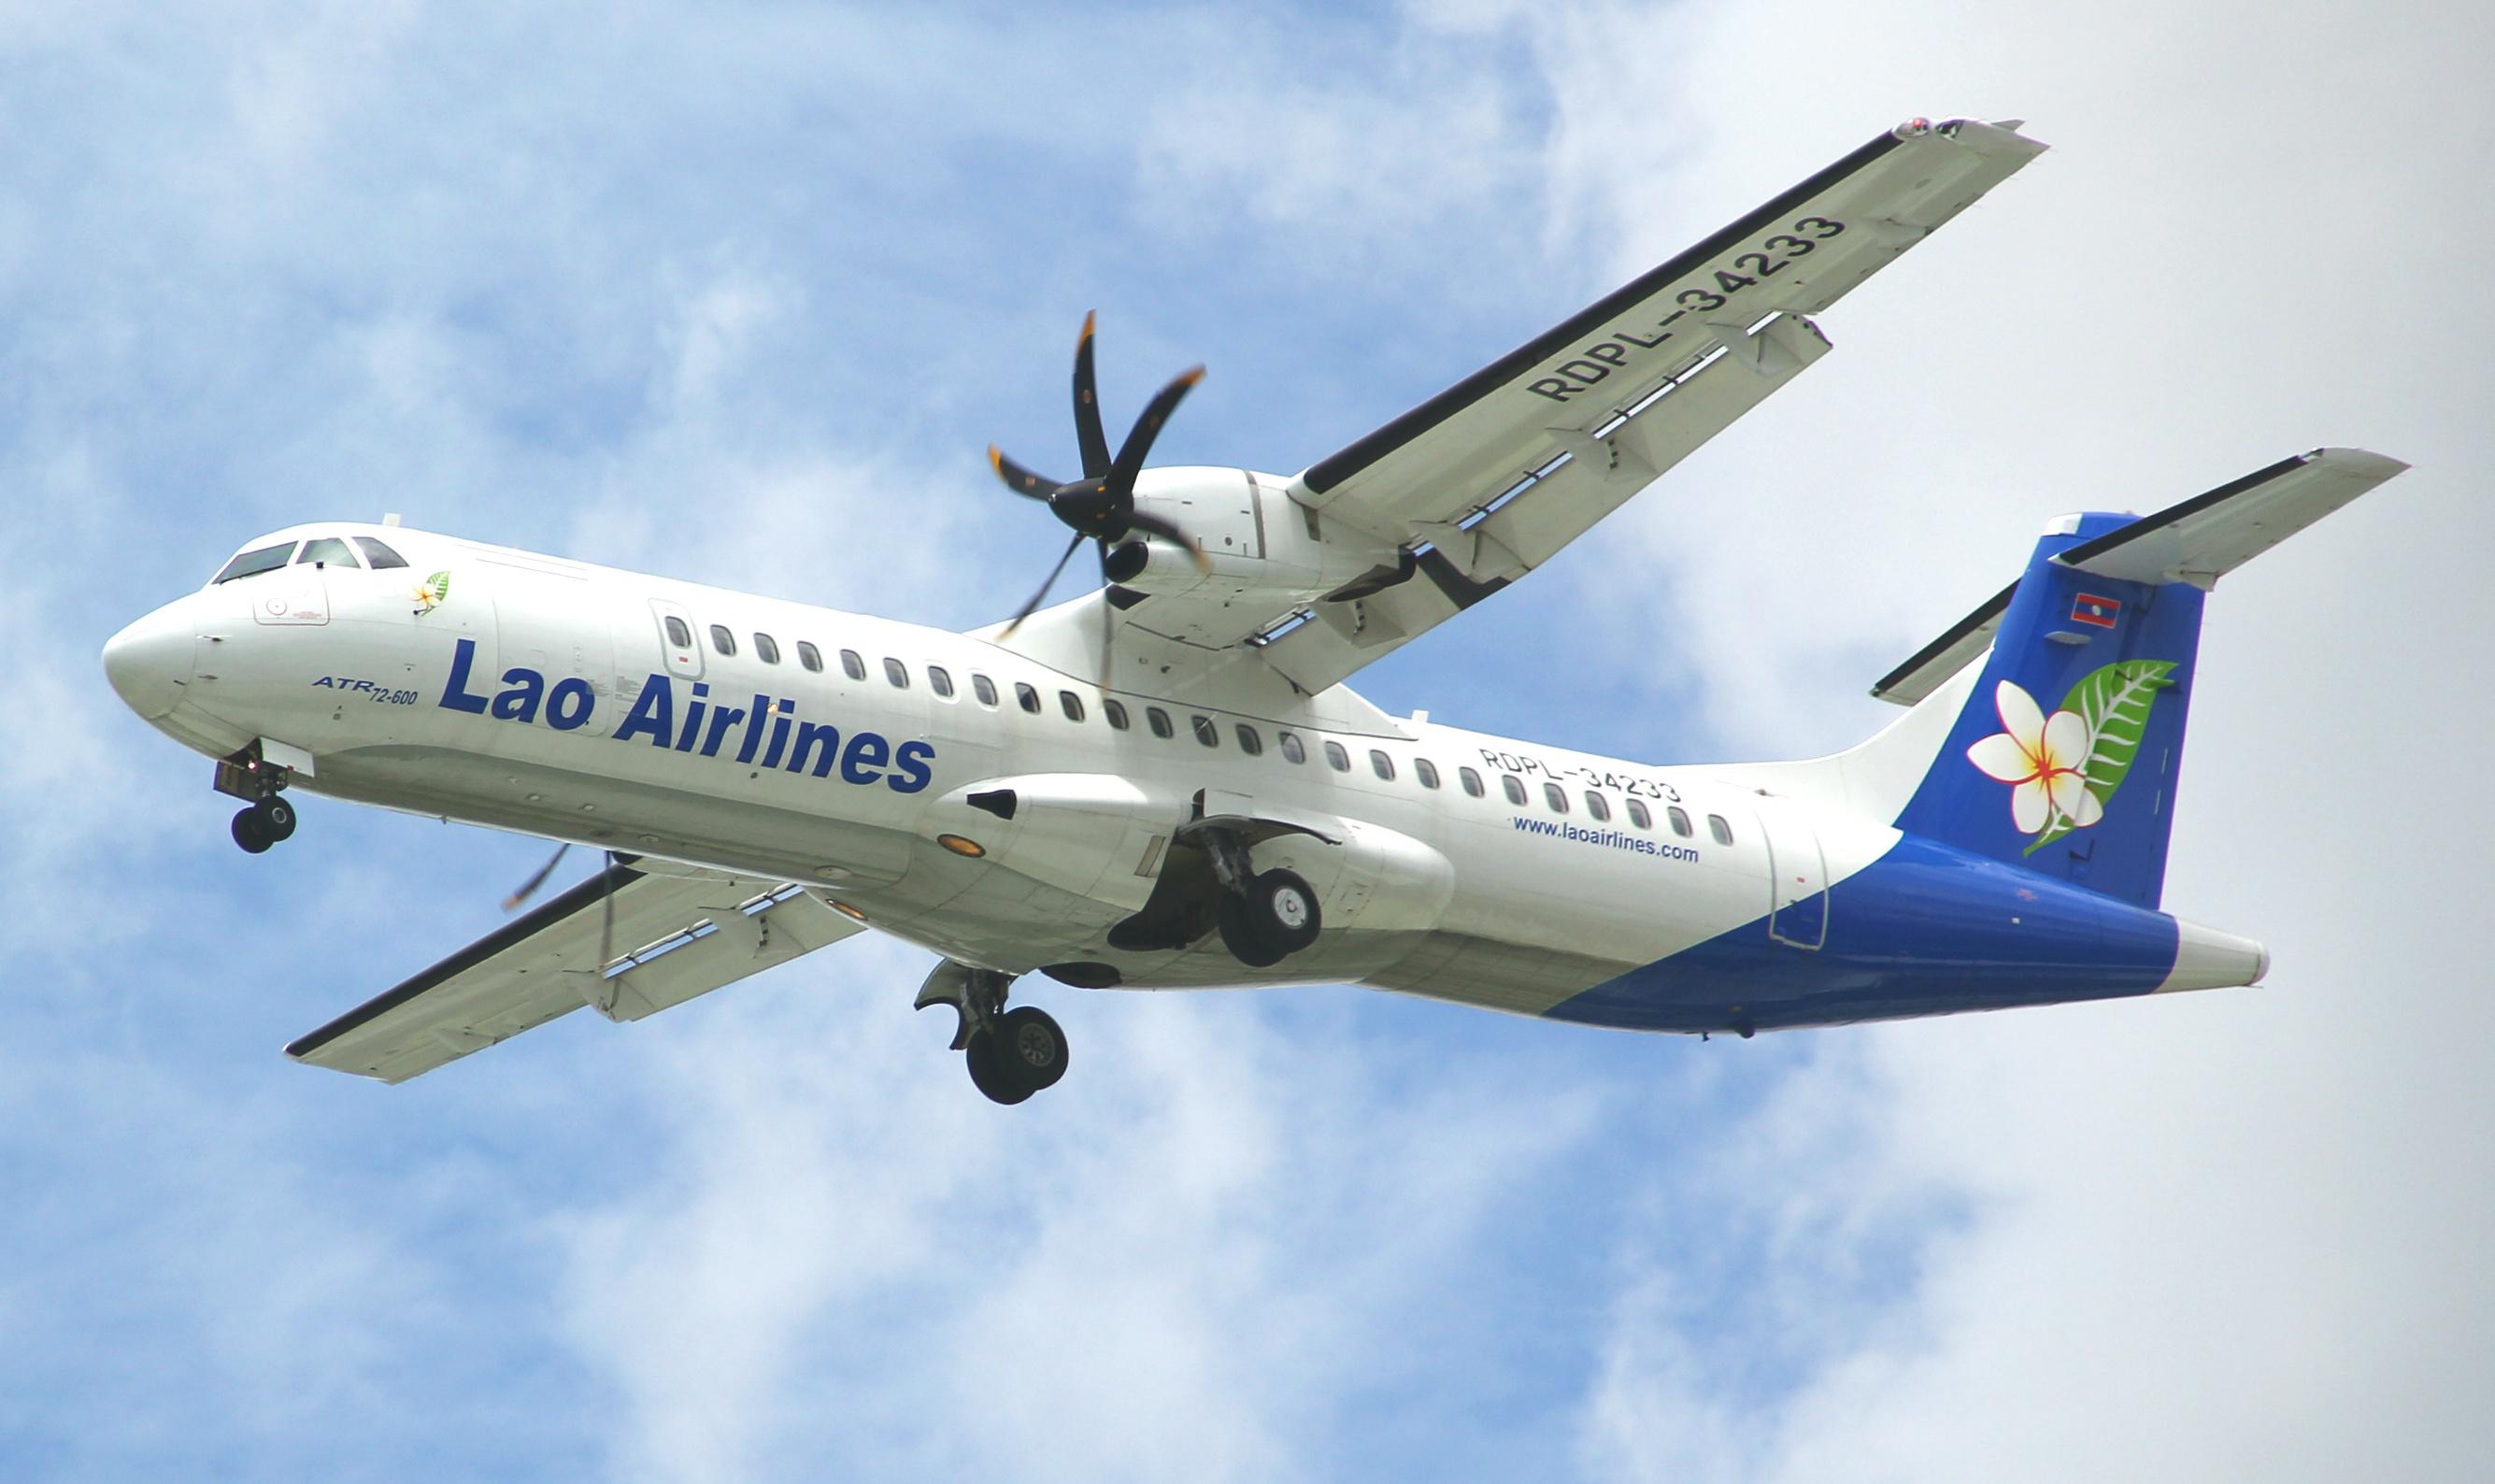 Lao Airlines ATR 72